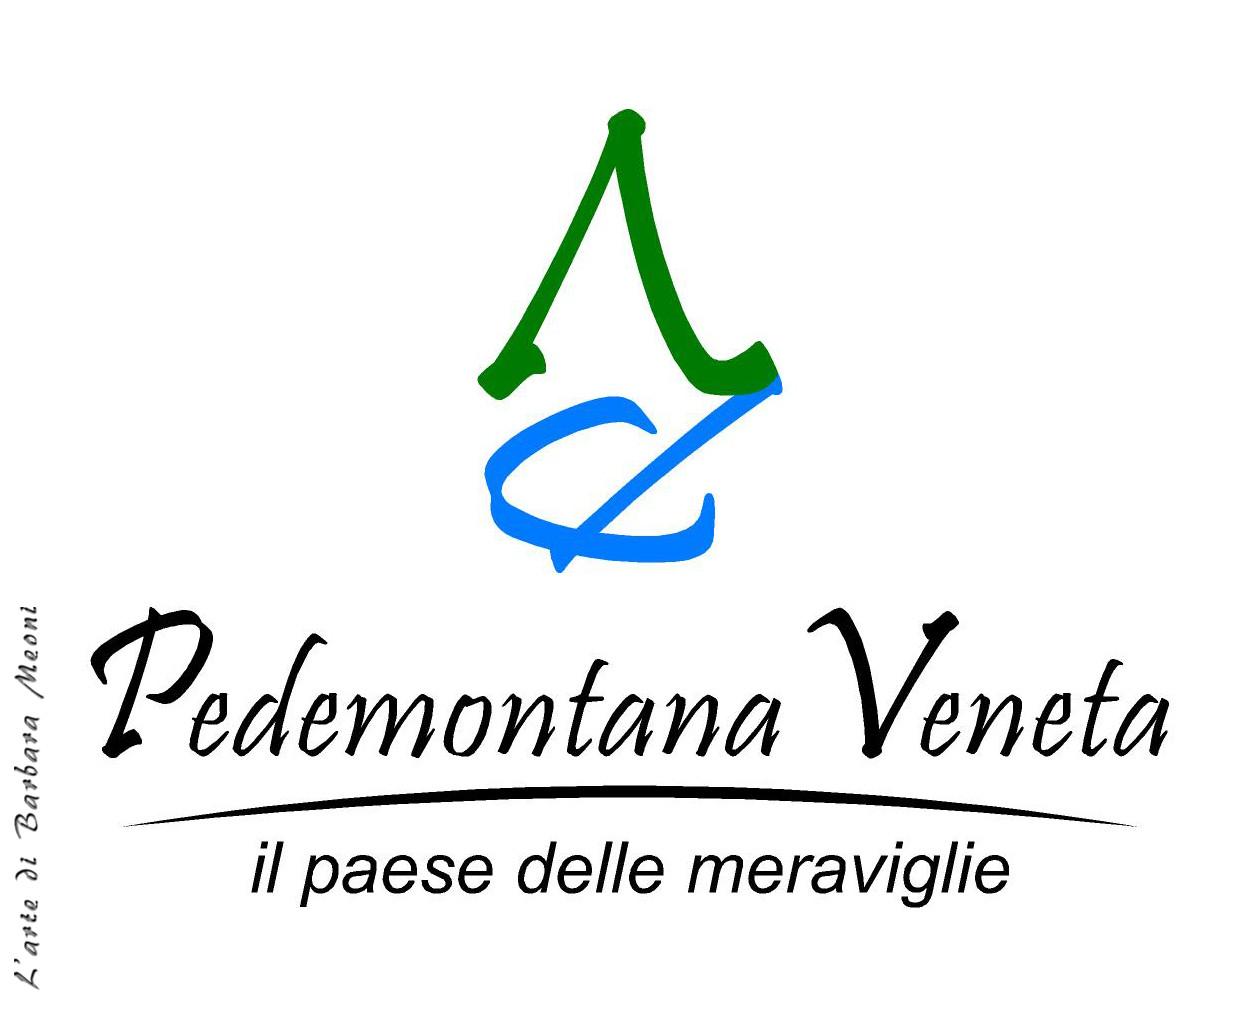 Contest di Pedemontana Veneta